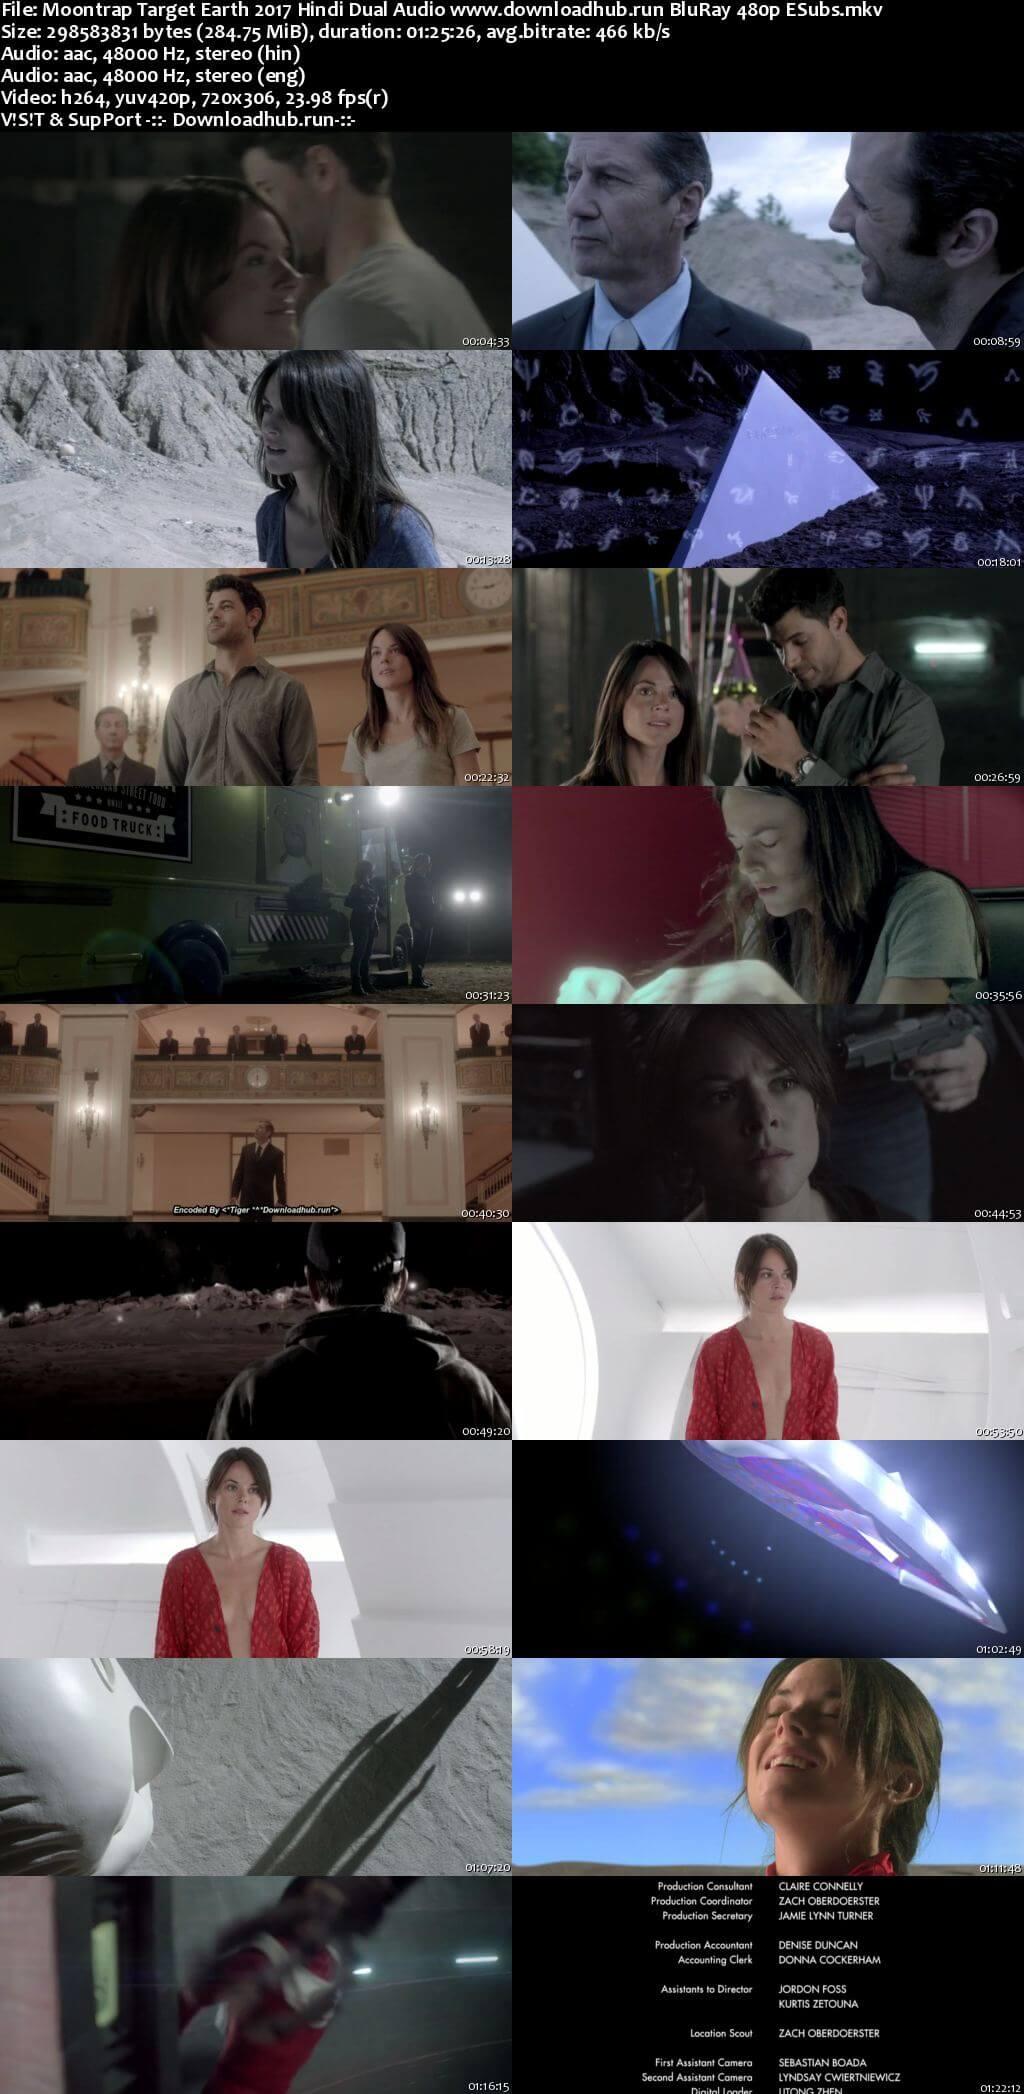 Moontrap Target Earth 2017 Hindi Dual Audio 280MB BluRay 480p ESubs